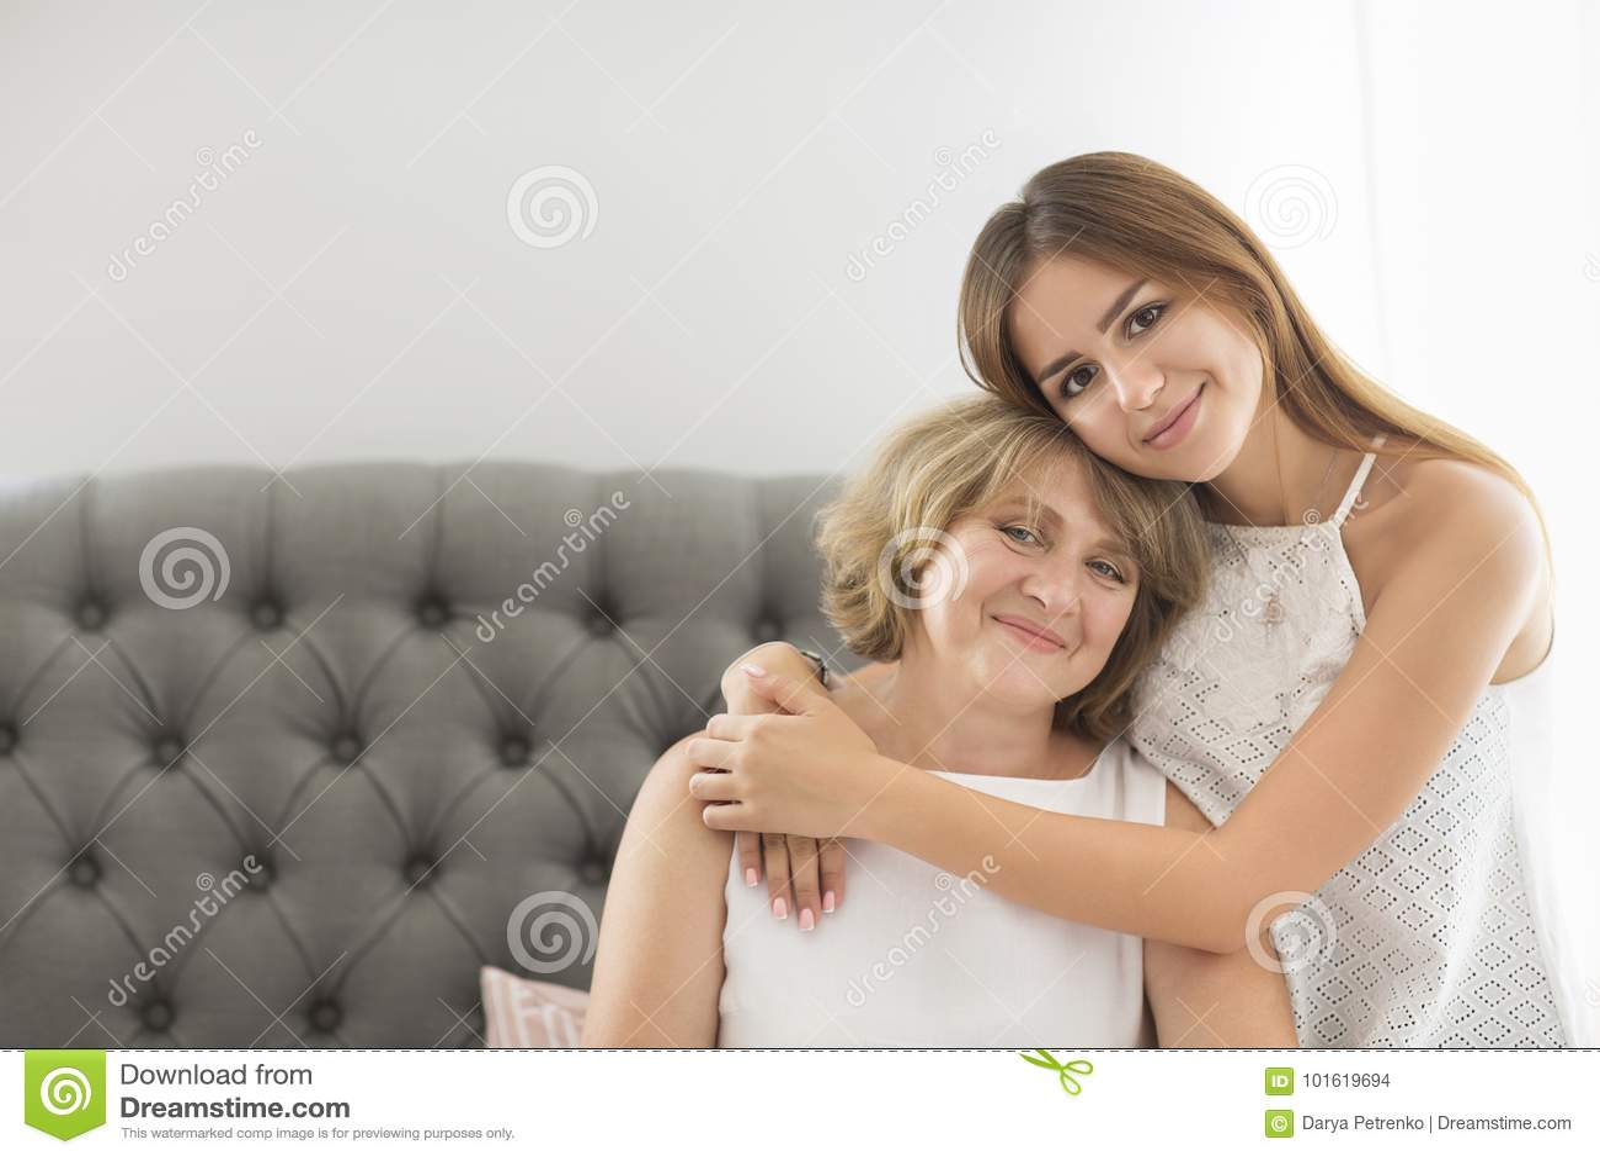 boobs lesbian big young